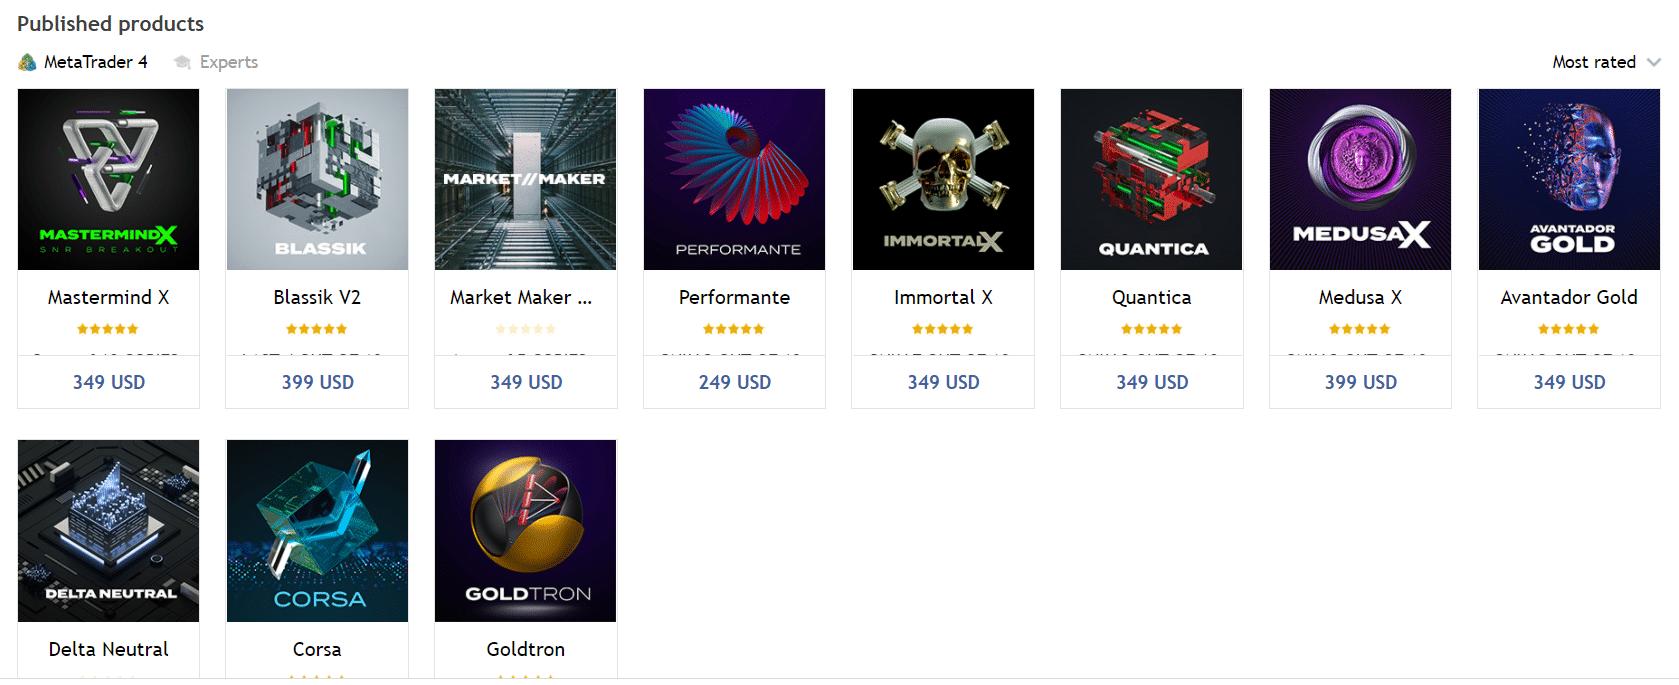 Medusa X Company Profile